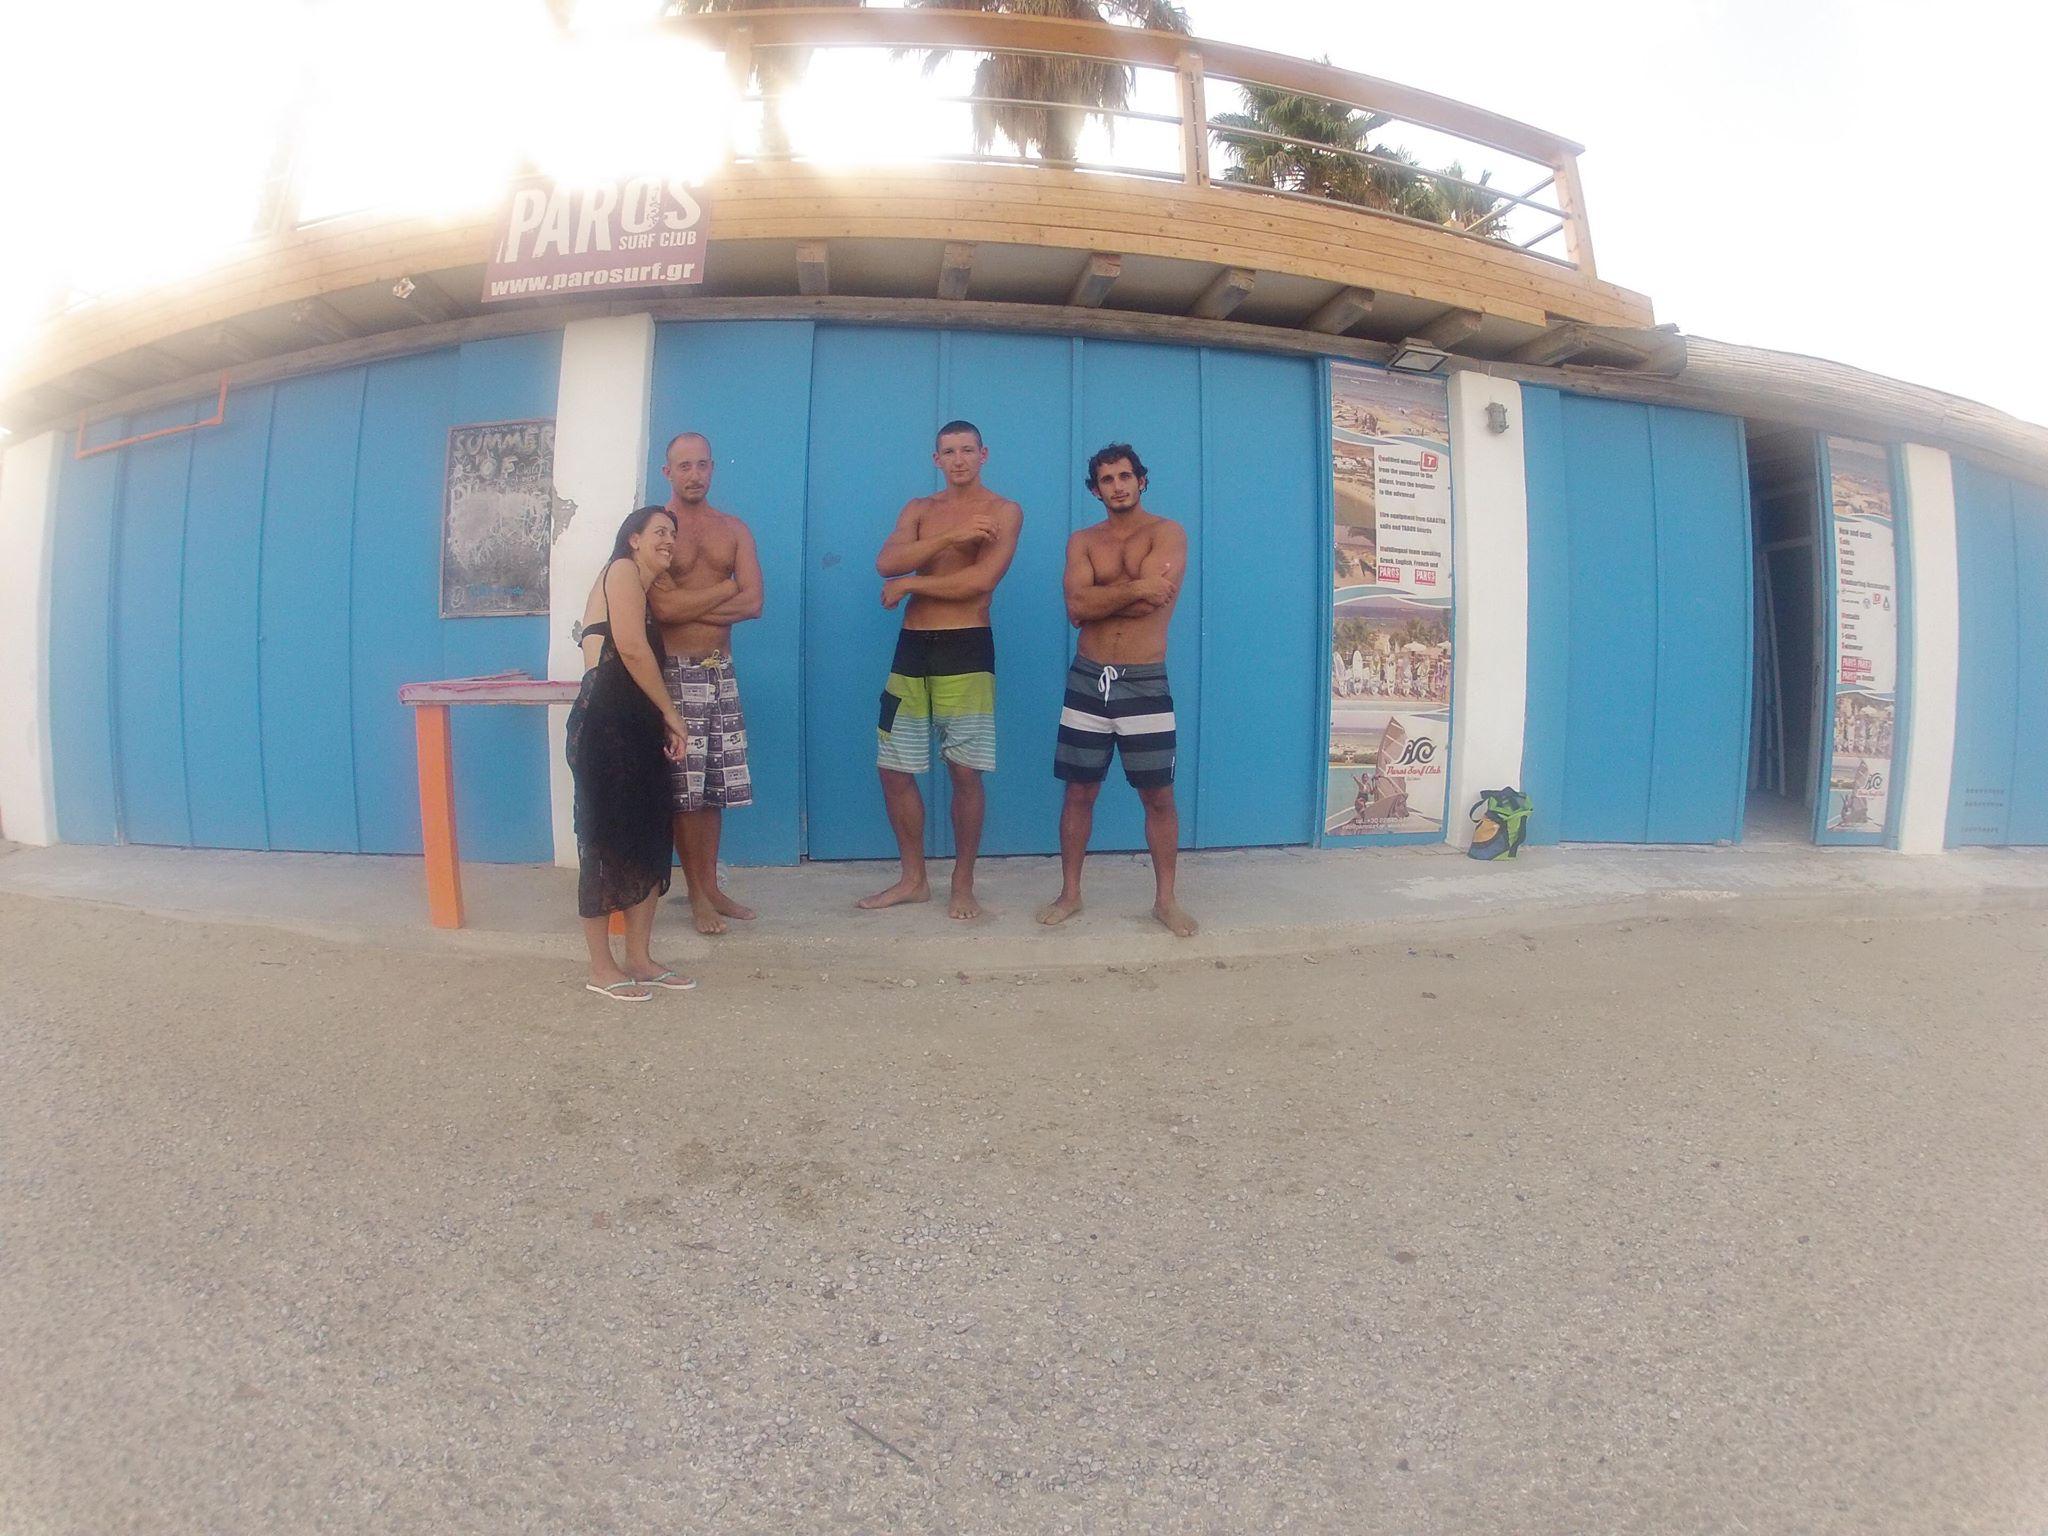 Paros surf club members